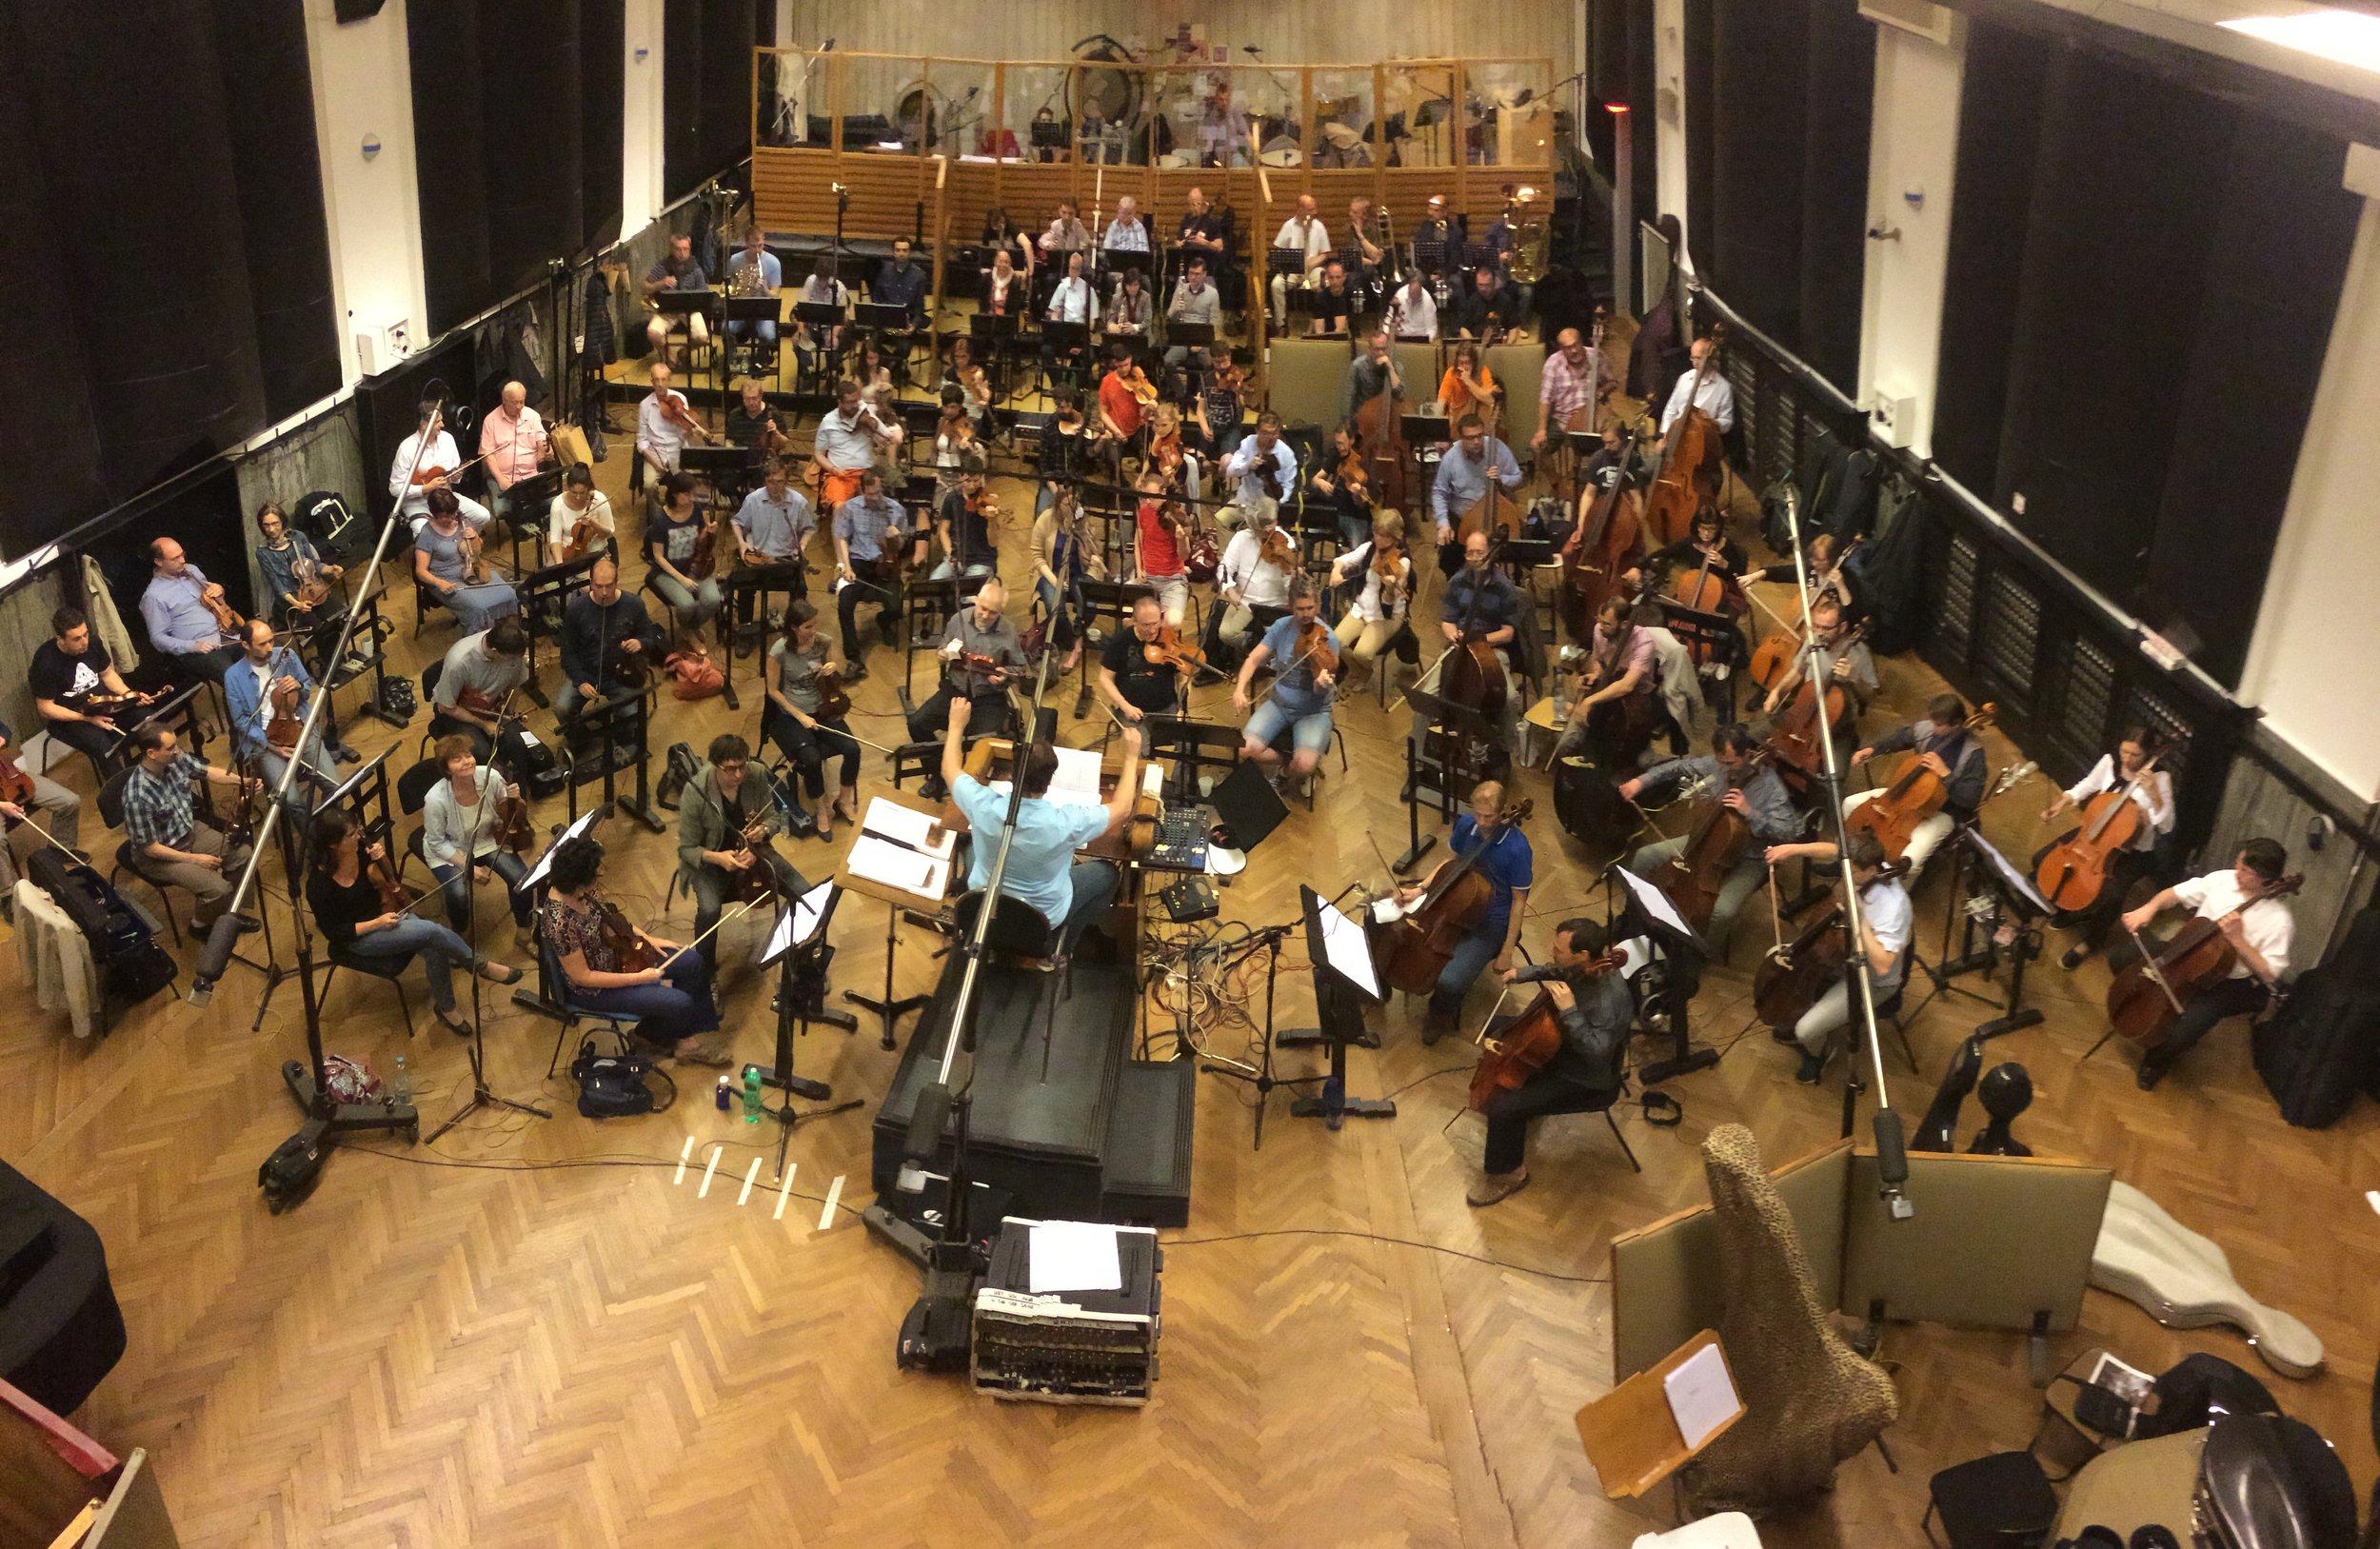 The Prague FILMharmonic Orchestra